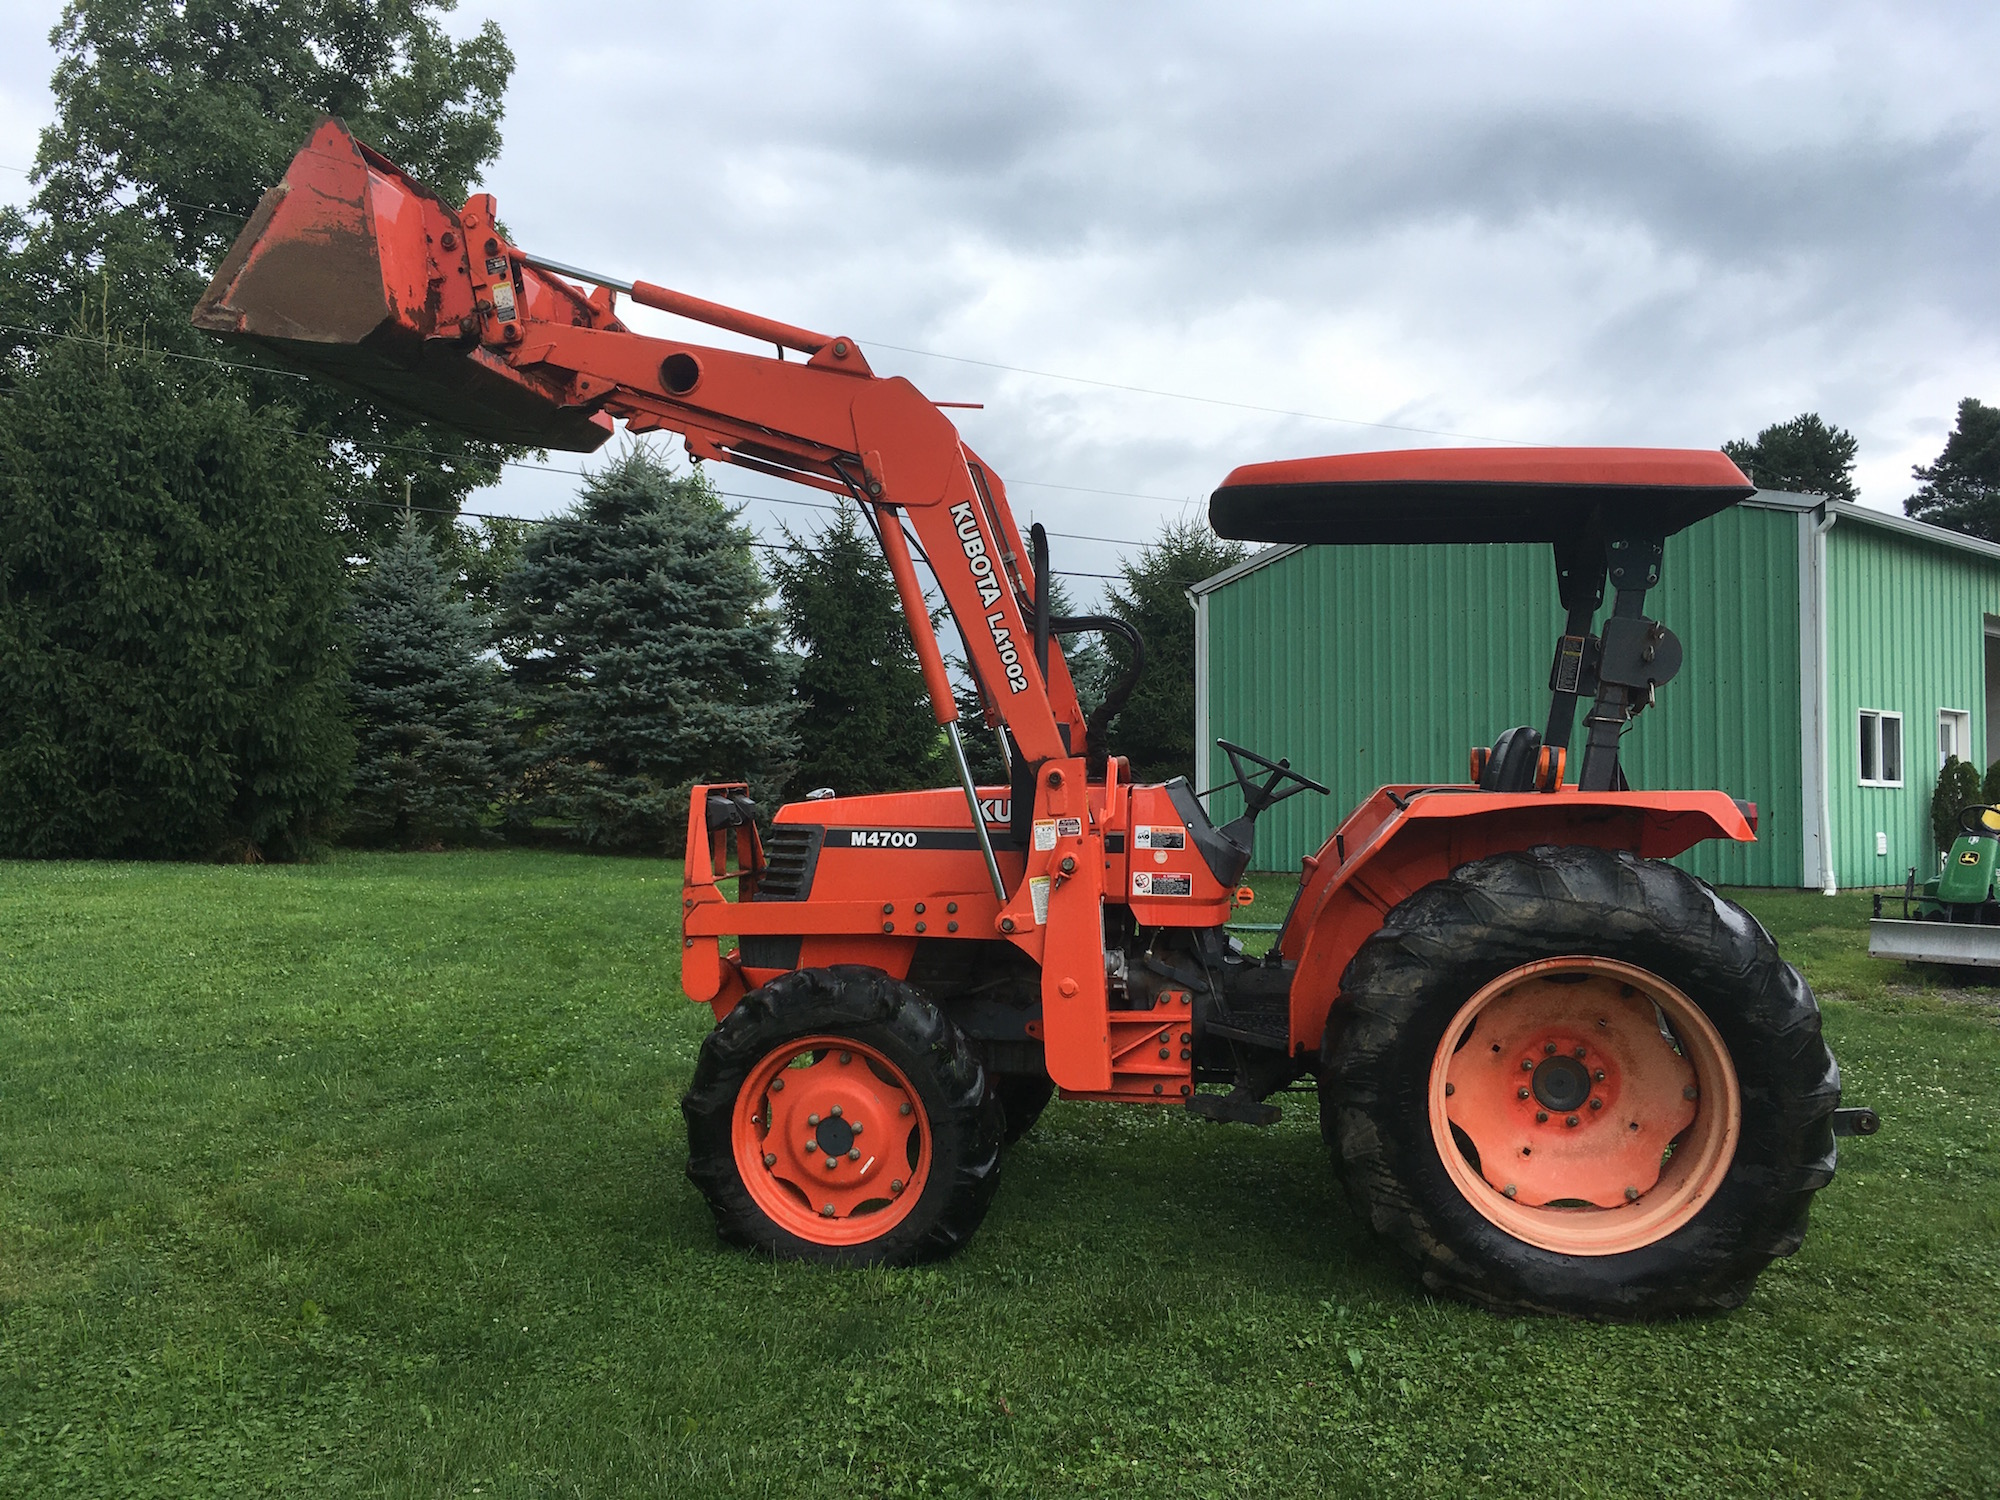 Kubota-M4700-Tractor-Loader_01